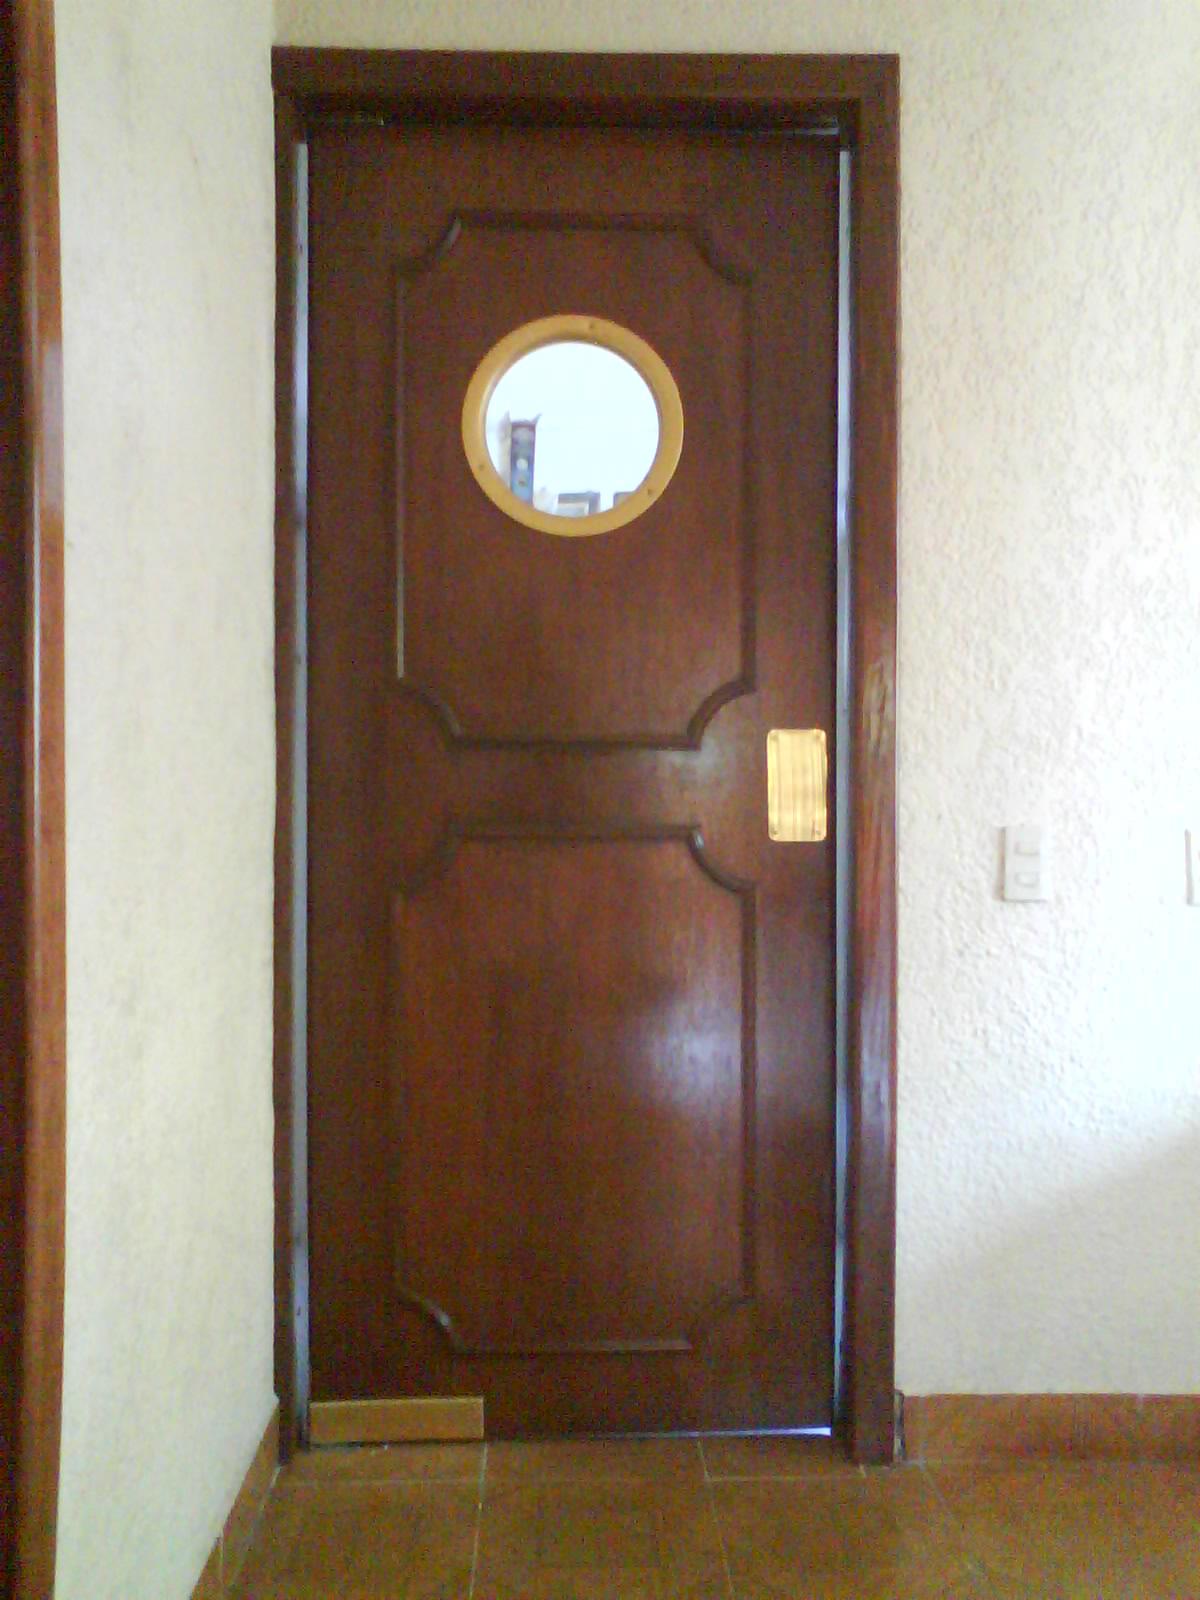 Puertas de cocina imagui for Puertas vaiven para cocina